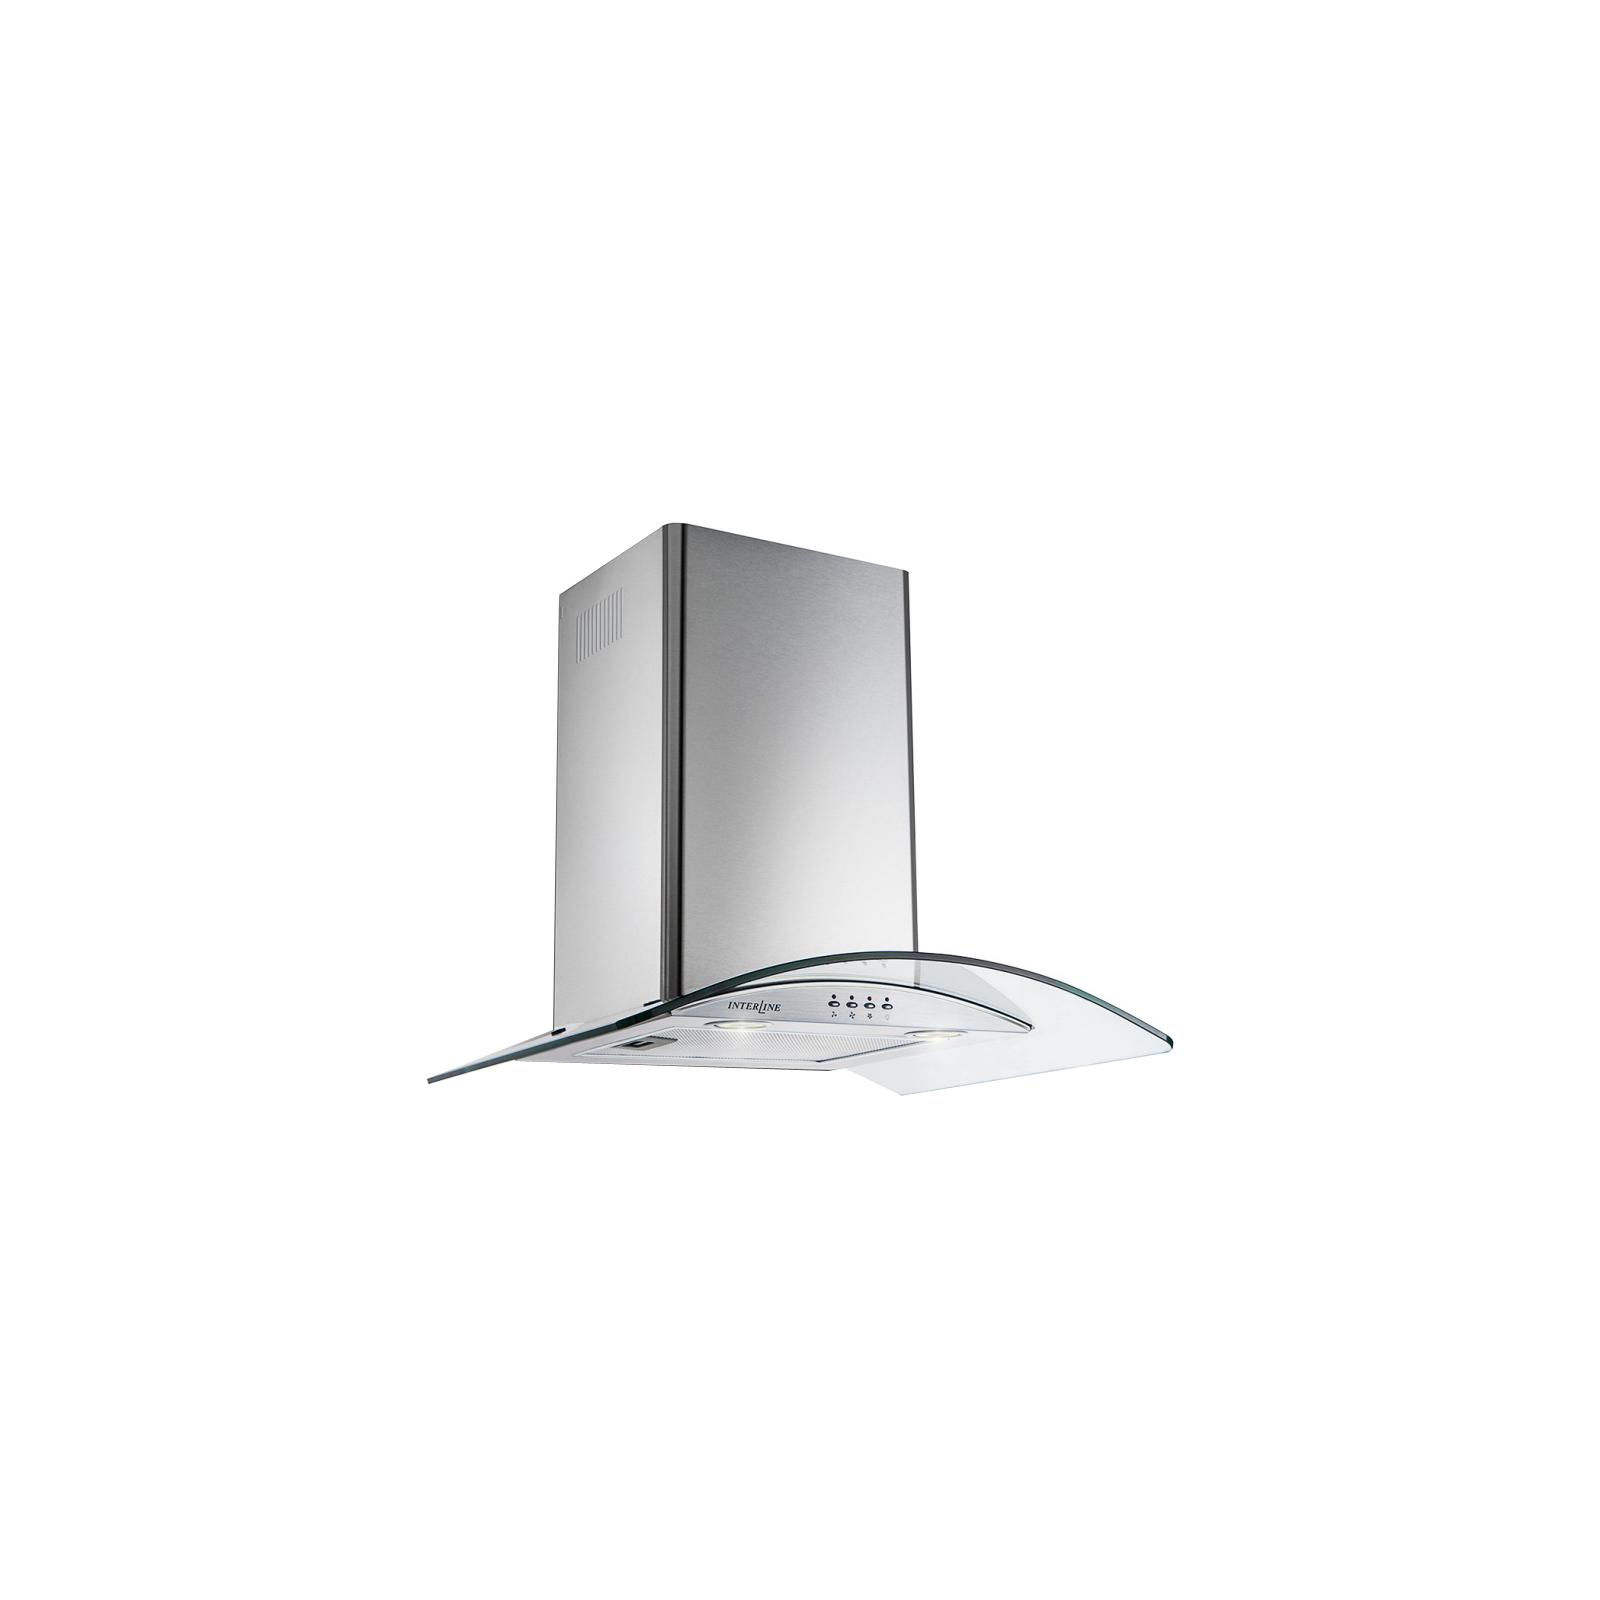 Вытяжка кухонная Interline EAGLE X/V A/60 EB